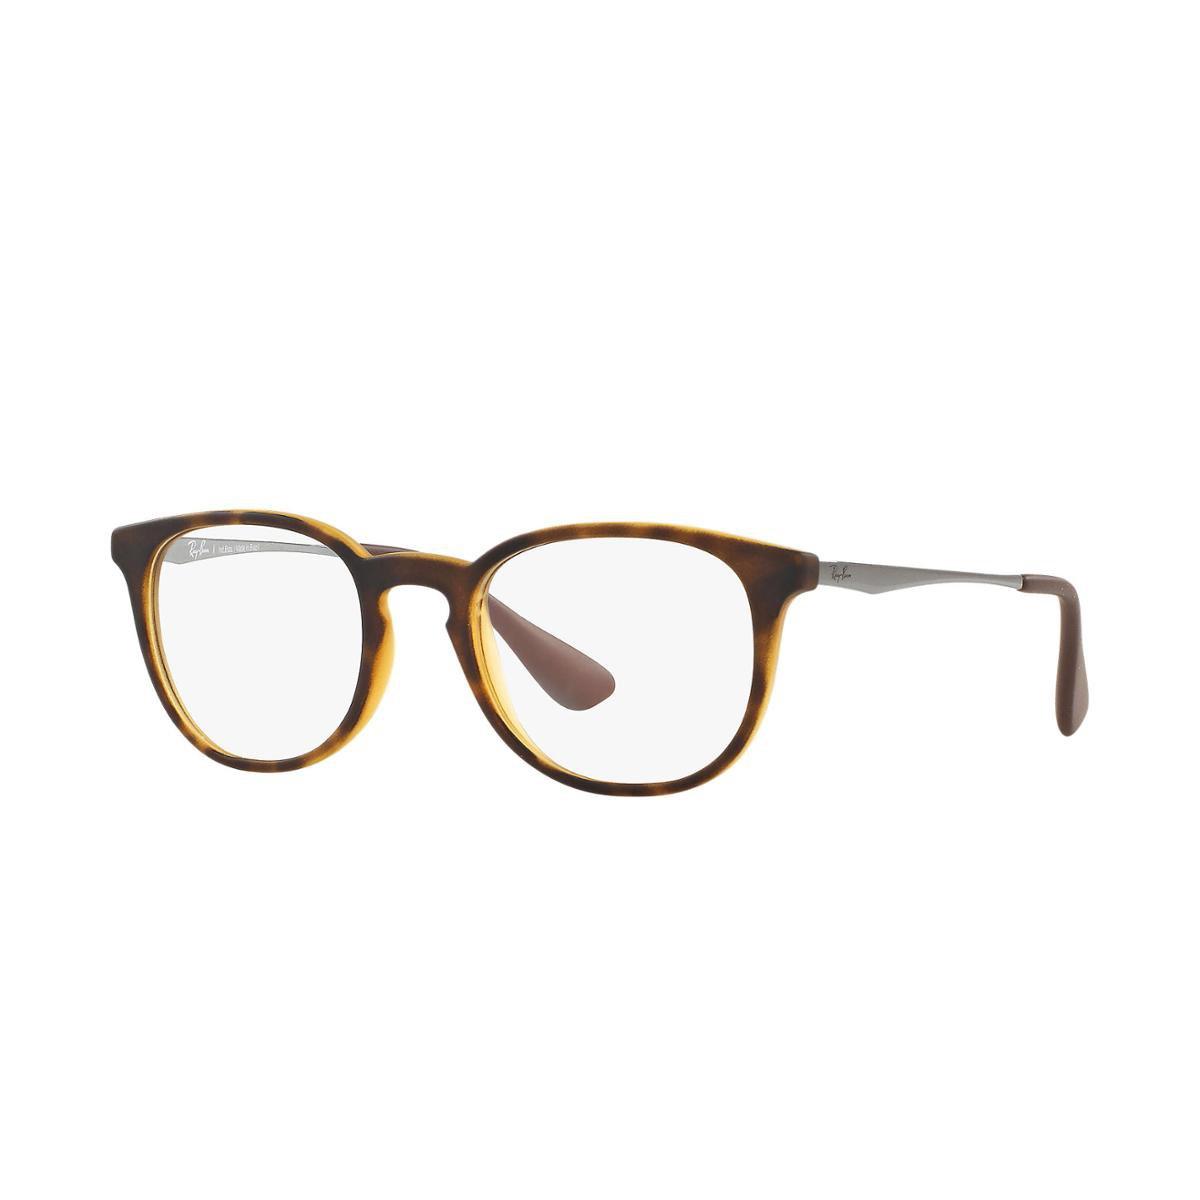 f11d4a566 Armacao De Oculos Ray Ban Feminino